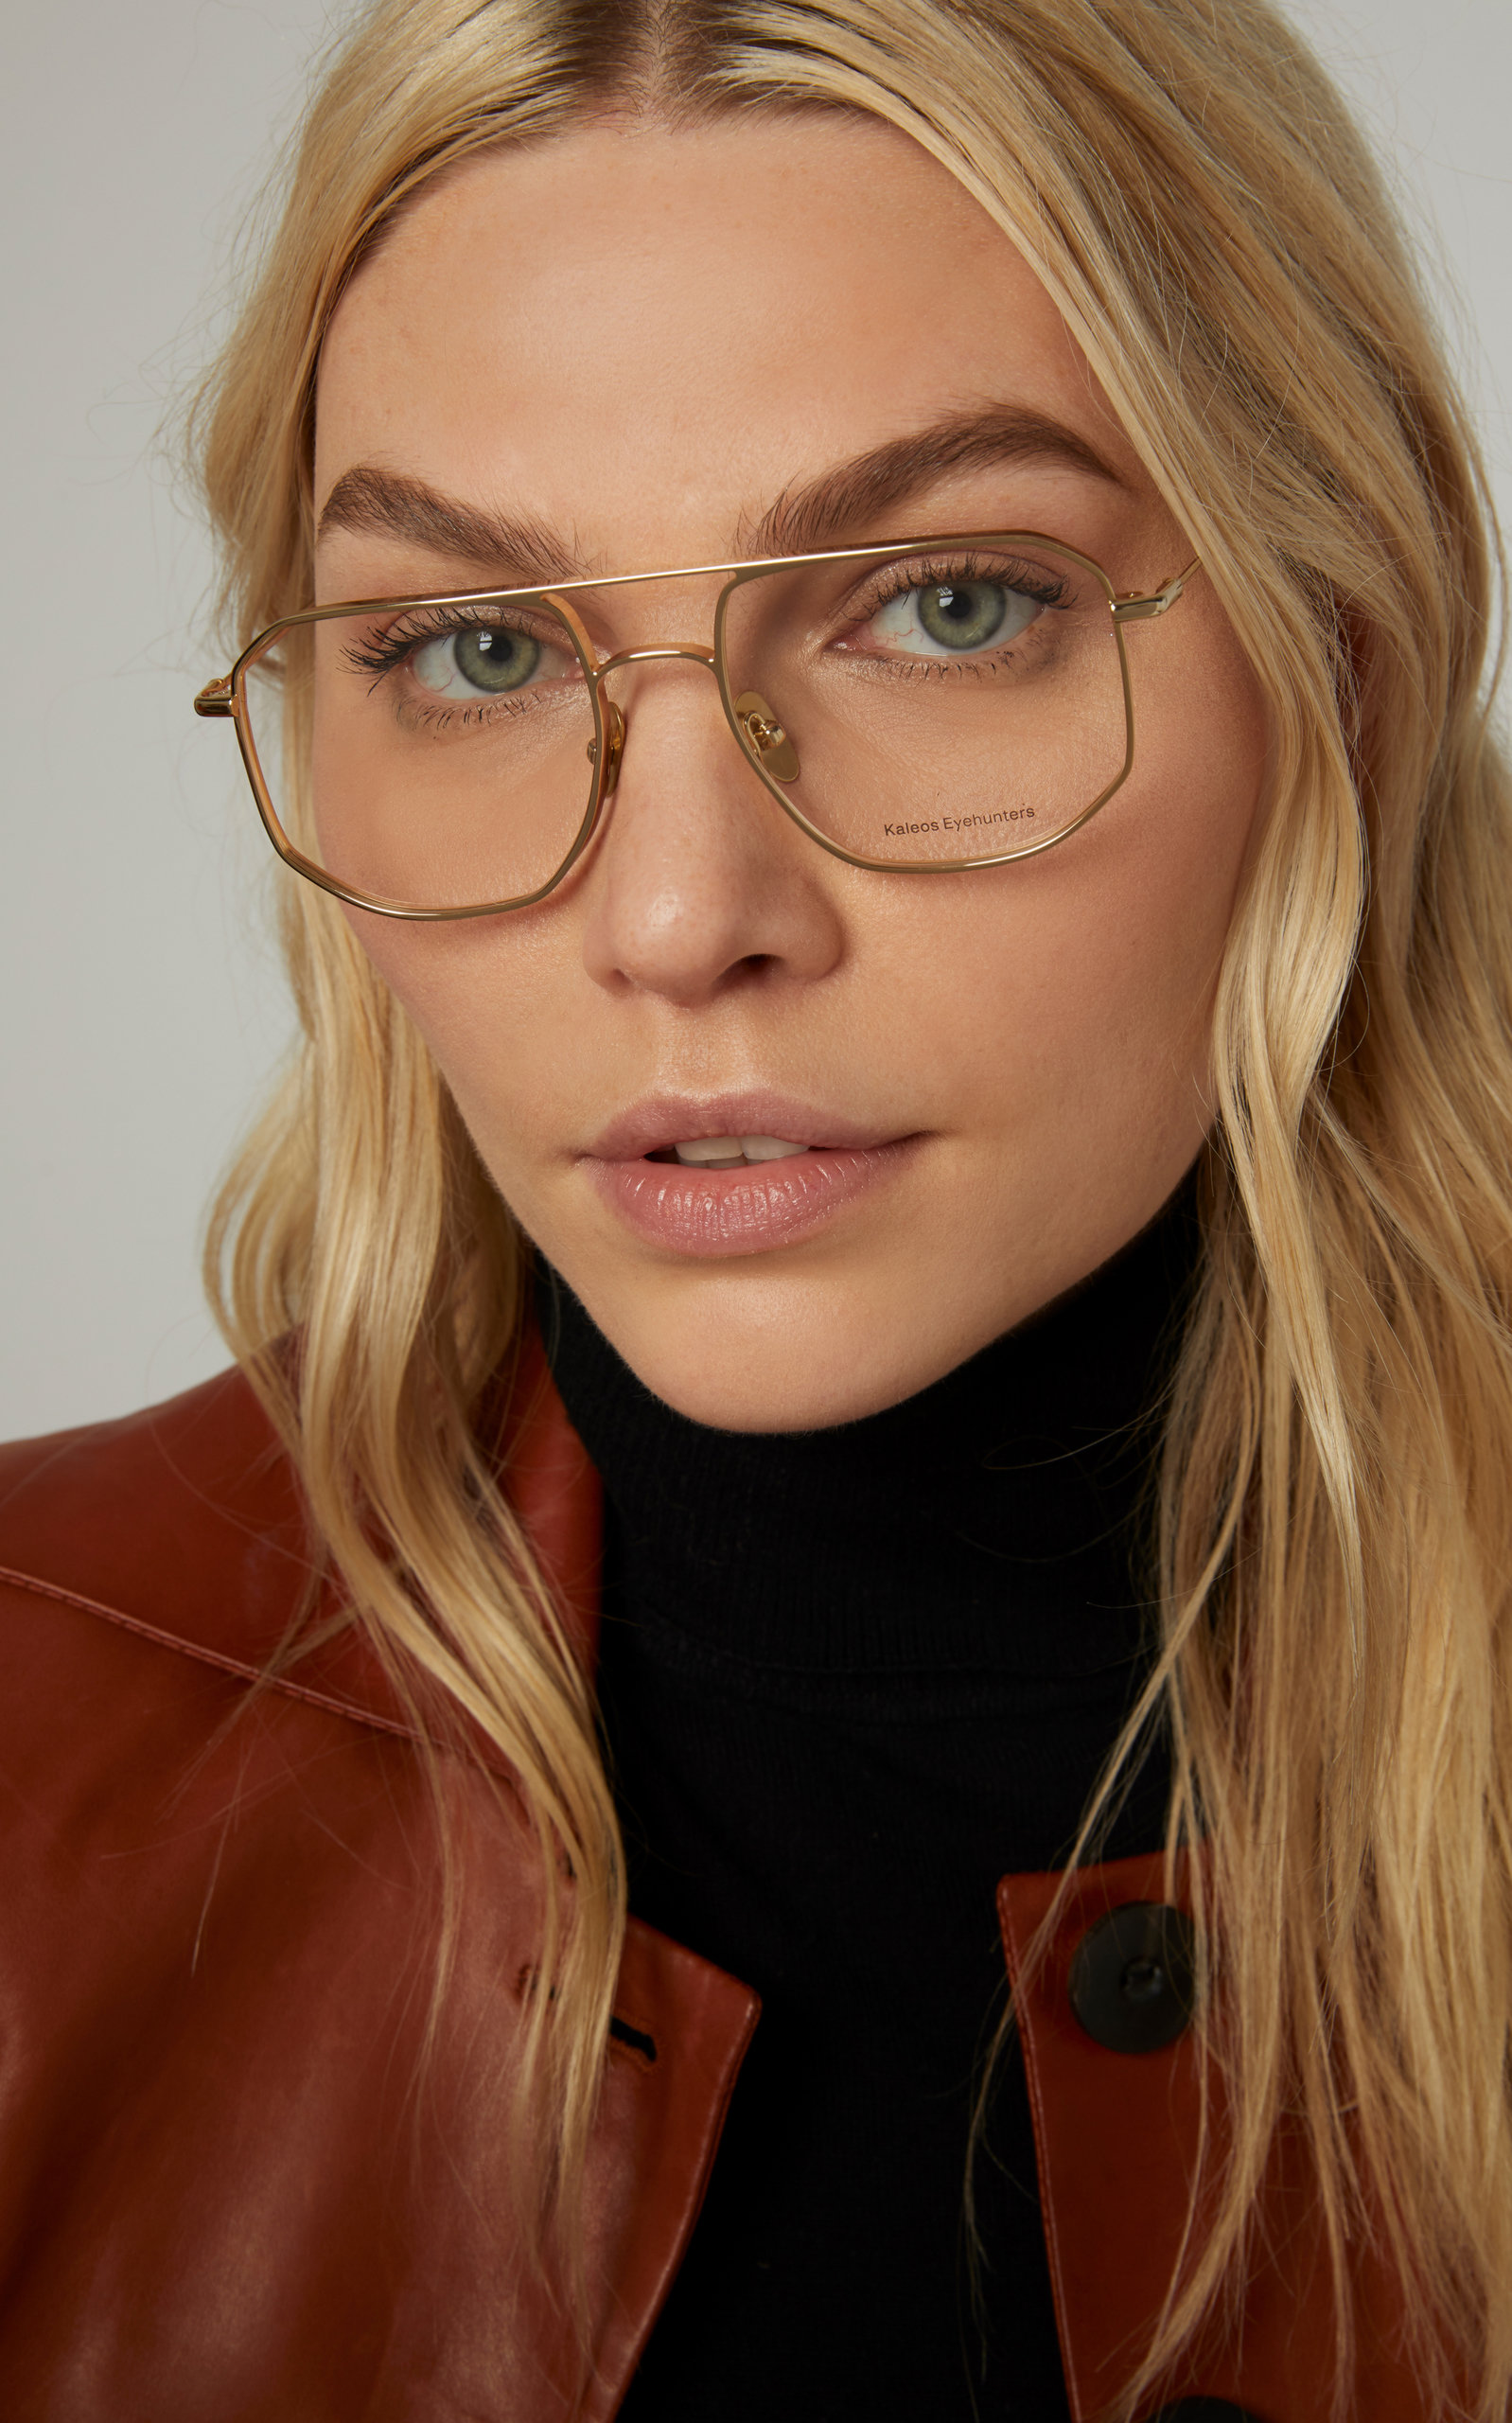 2bd94a2040c Willard Aviator Glasses by Kaleos Eyehunters